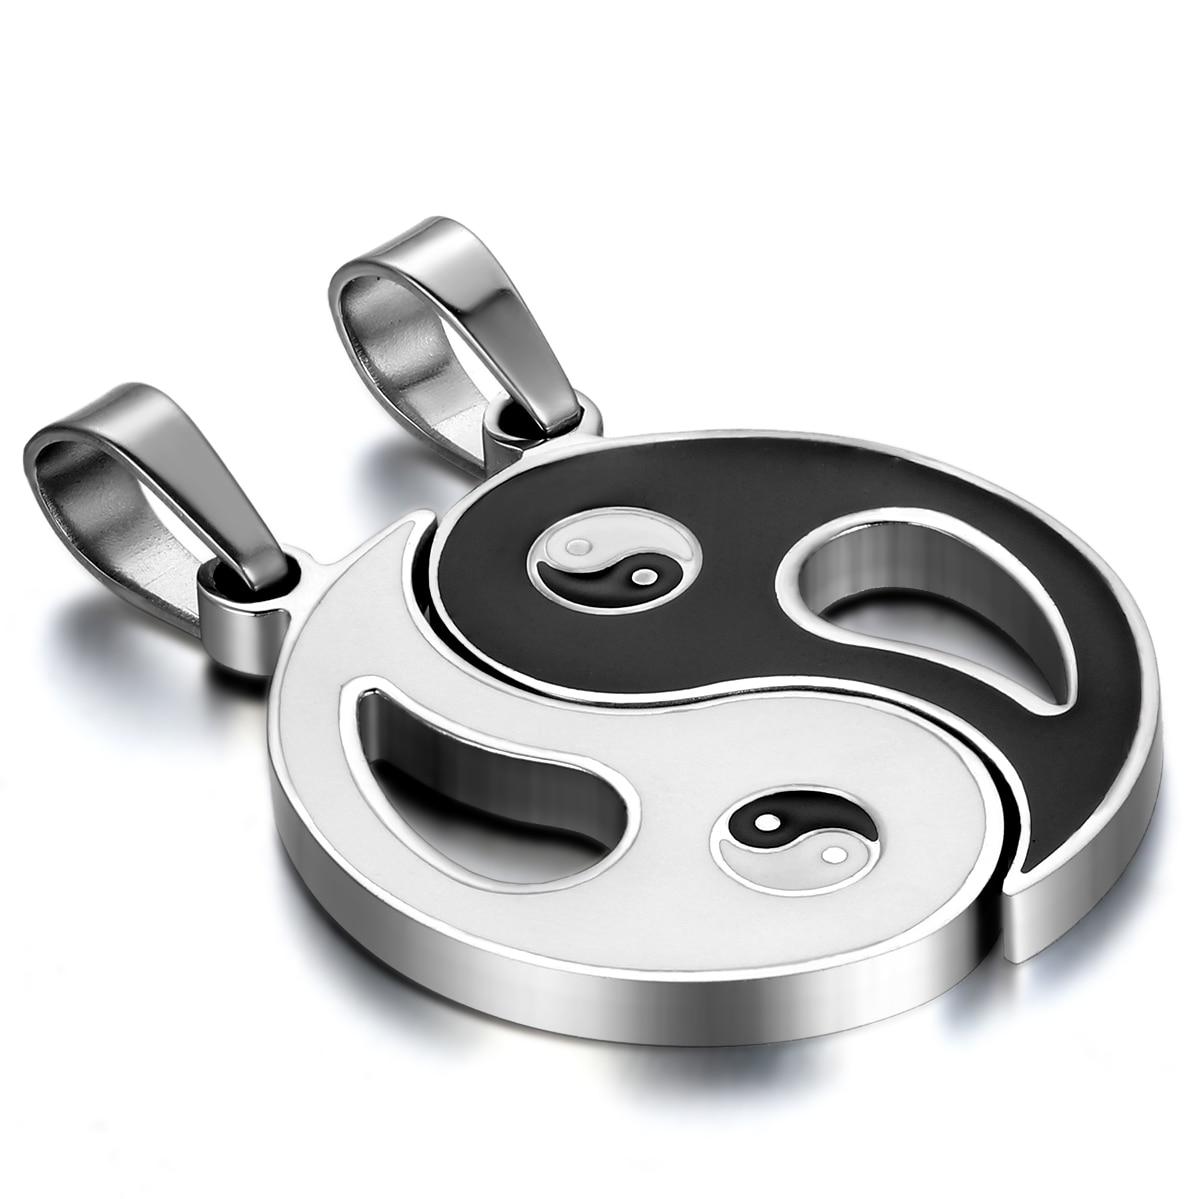 BONISKISS Stainless Steel Chinese Mystical Yin Yang Tai Chi Ba Gua Matching Pendant Gold Silver Black With Chian(Pair)